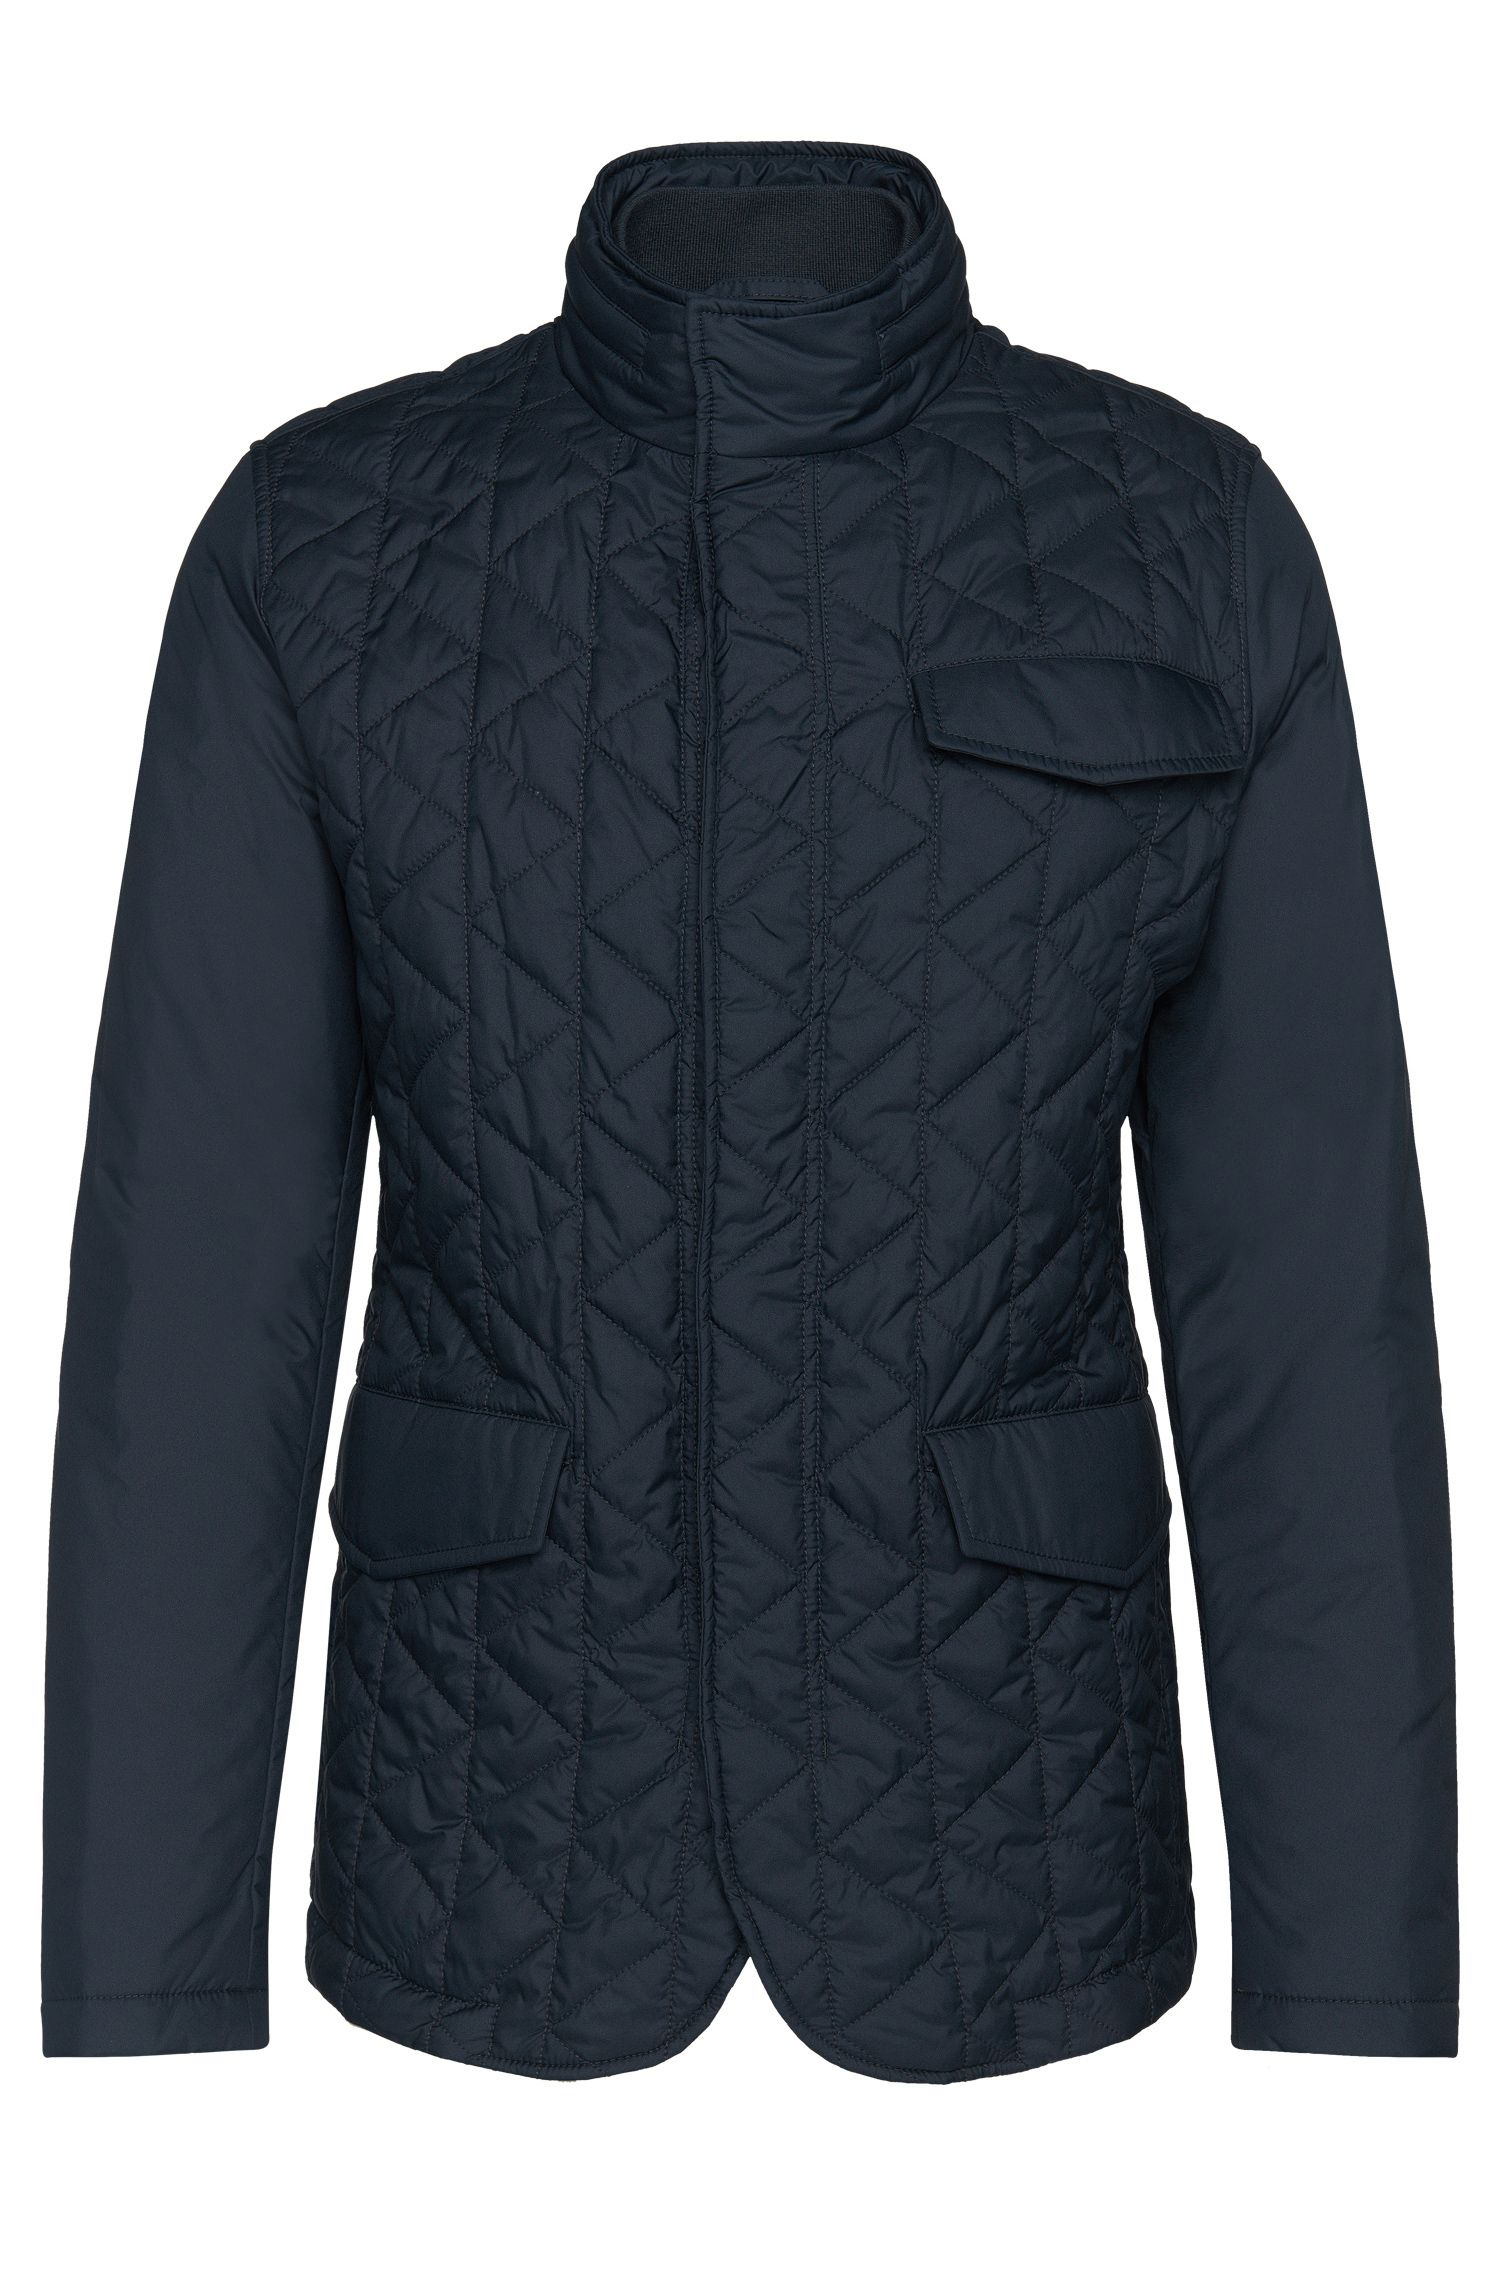 Gewatteerde jas met geïntegreerde capuchon: 'Cadell'